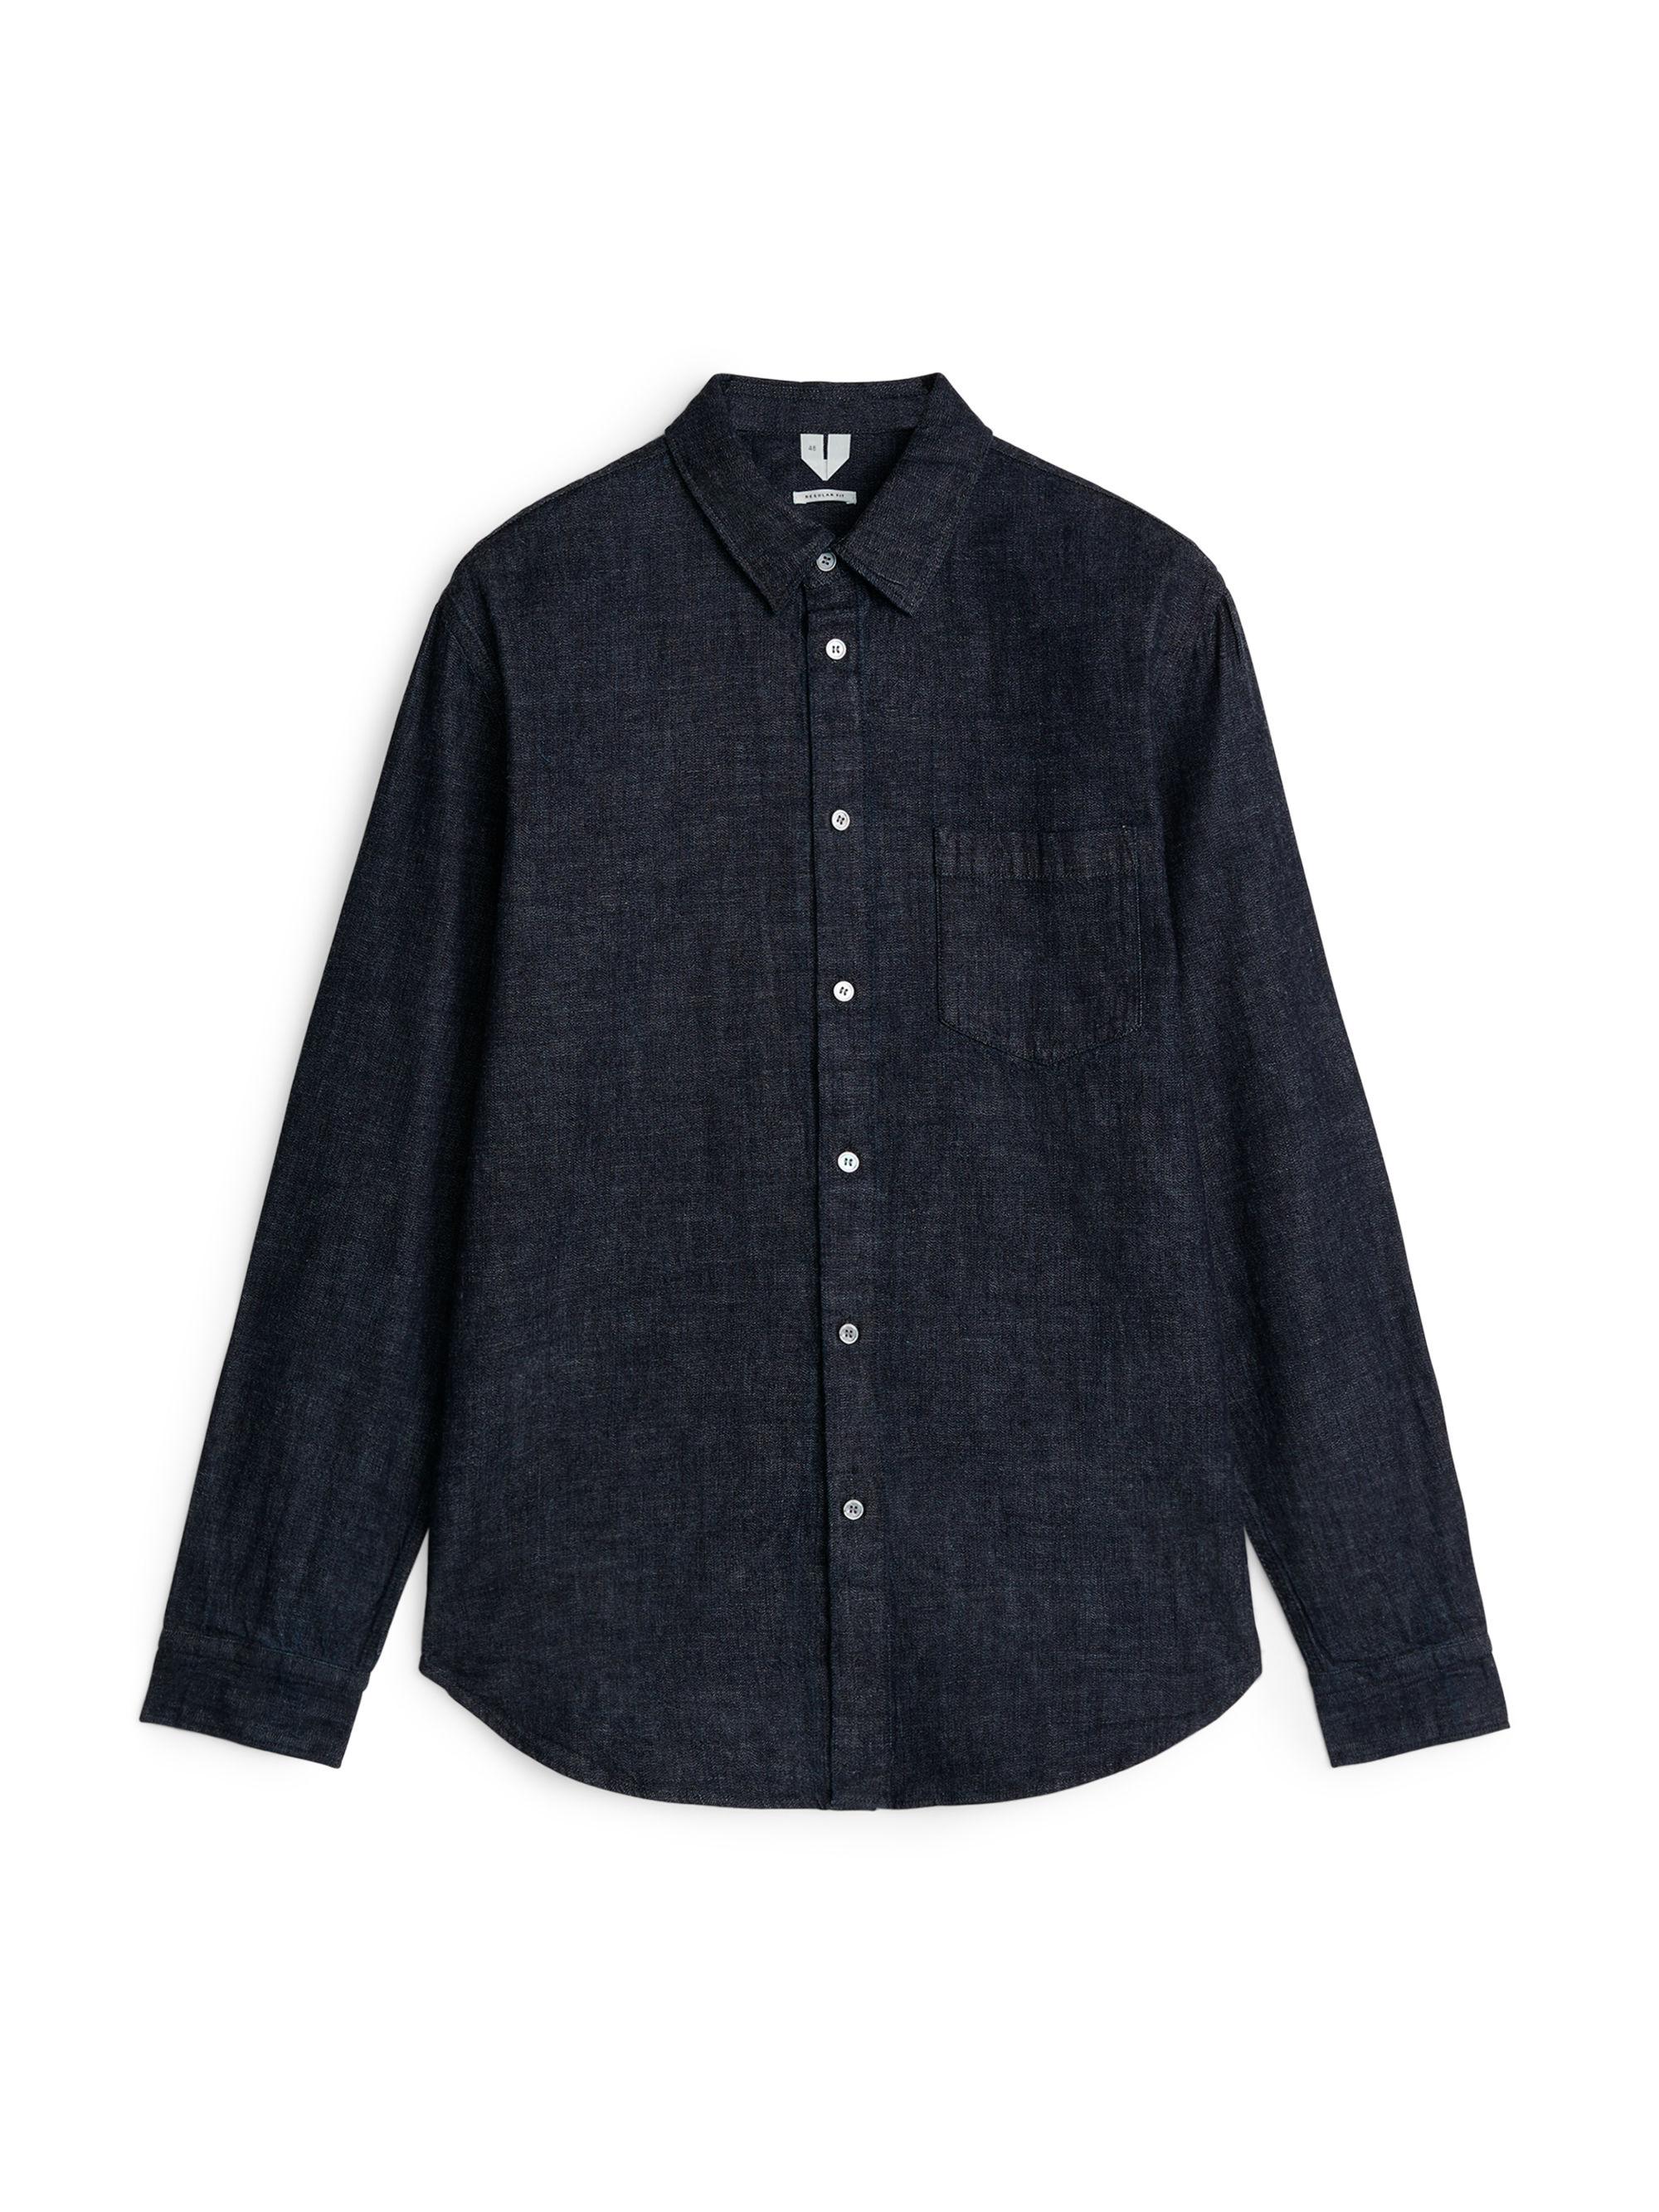 Denim Shirt, Arket, £79